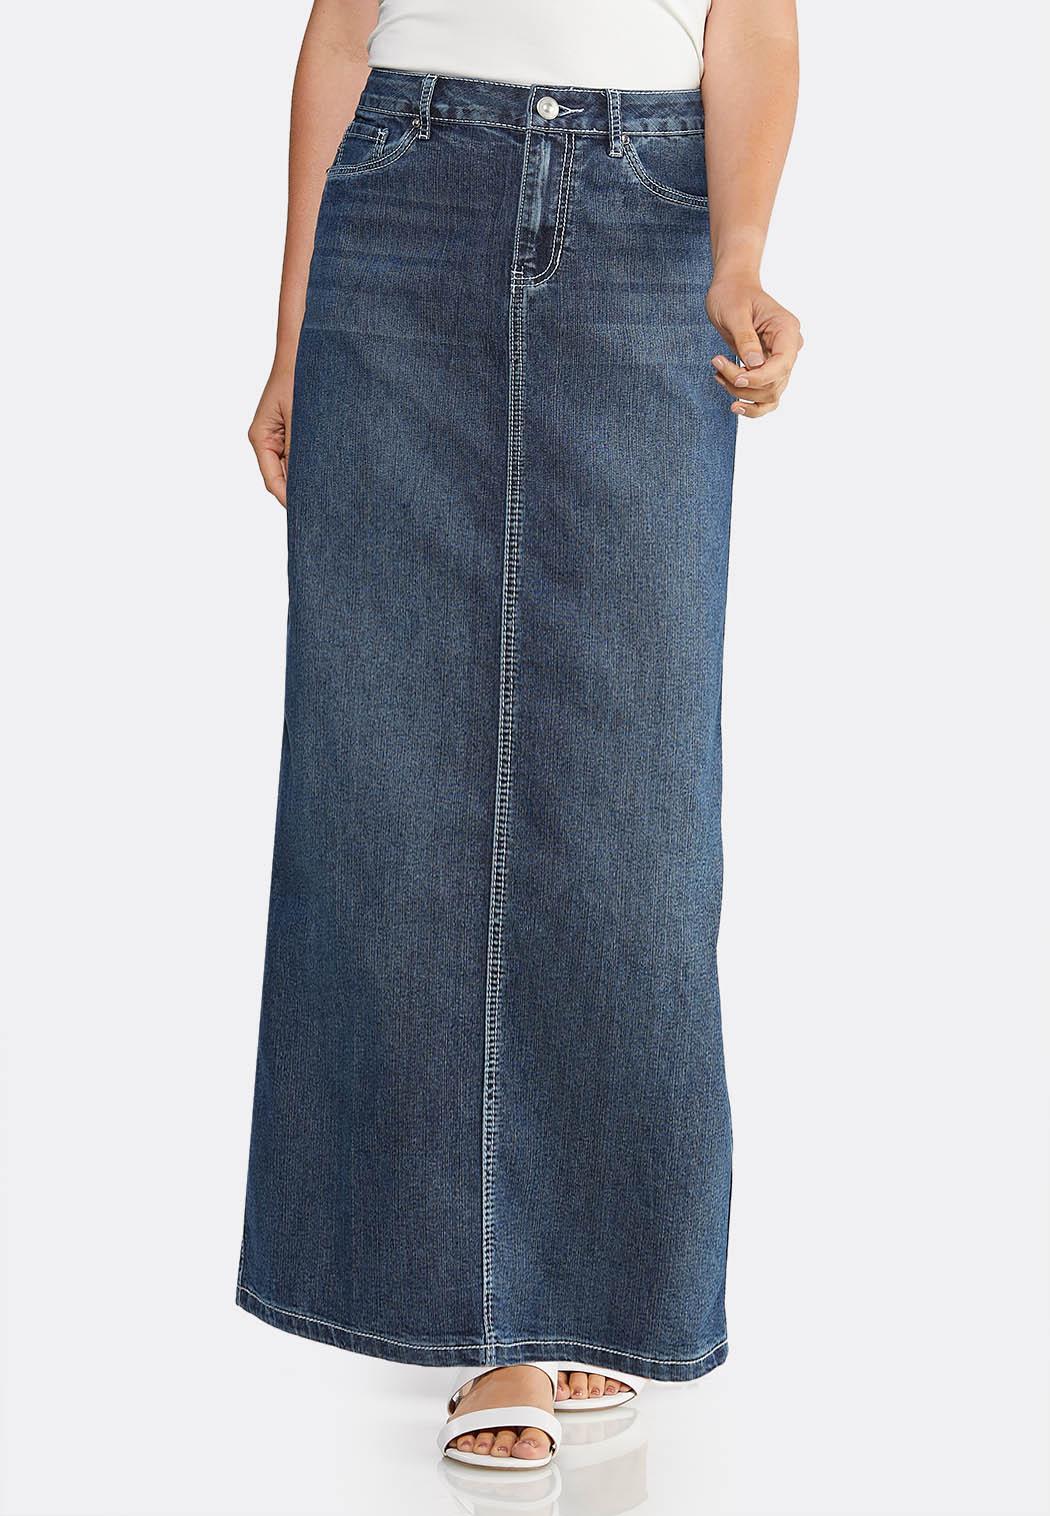 Dark Denim Maxi Skirt